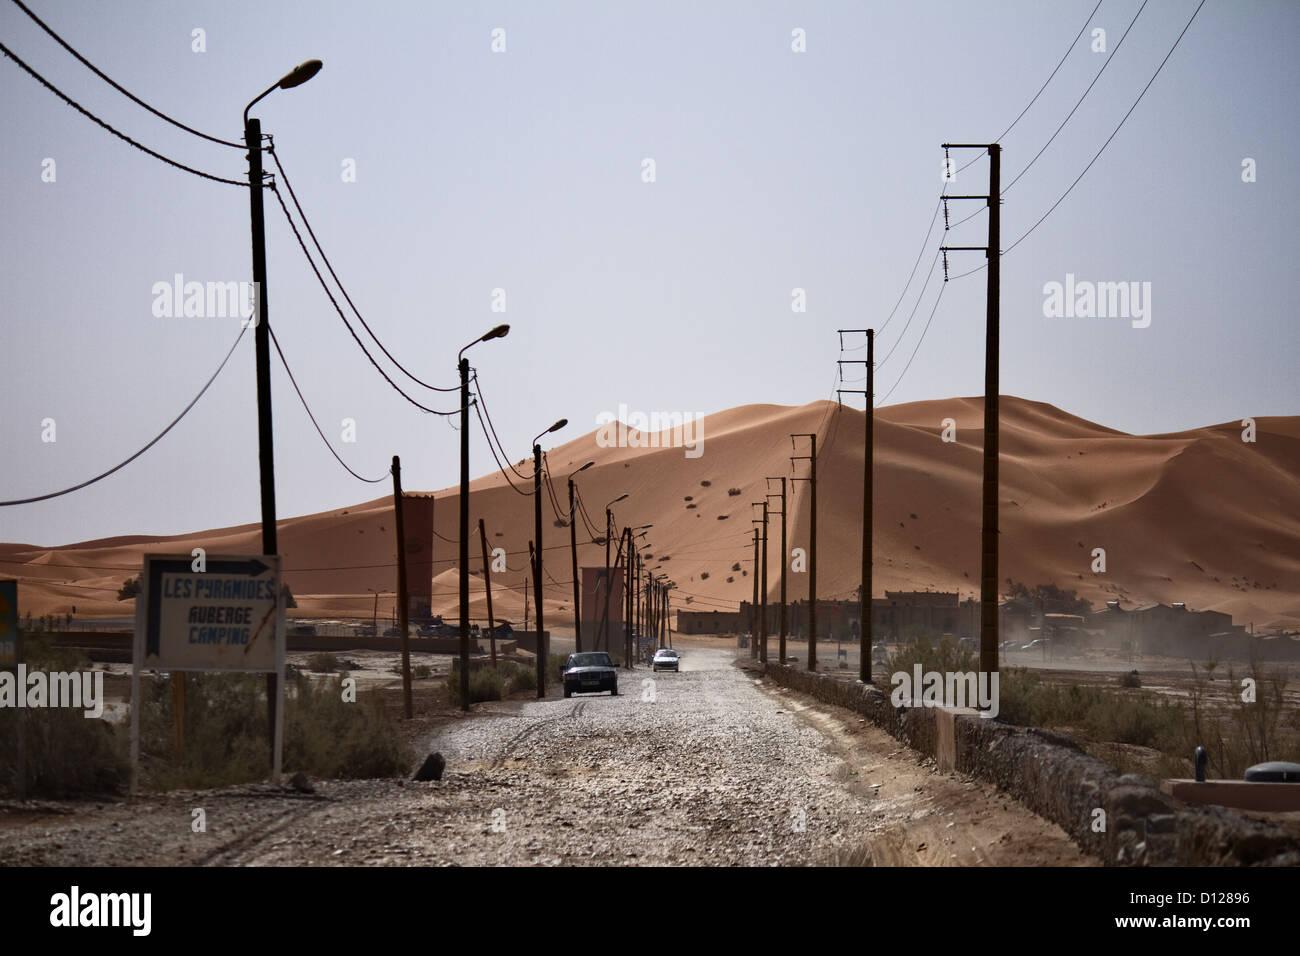 Merzouga, Erg Chebbi, Sahara, Morocco, Dune, Street - Stock Image